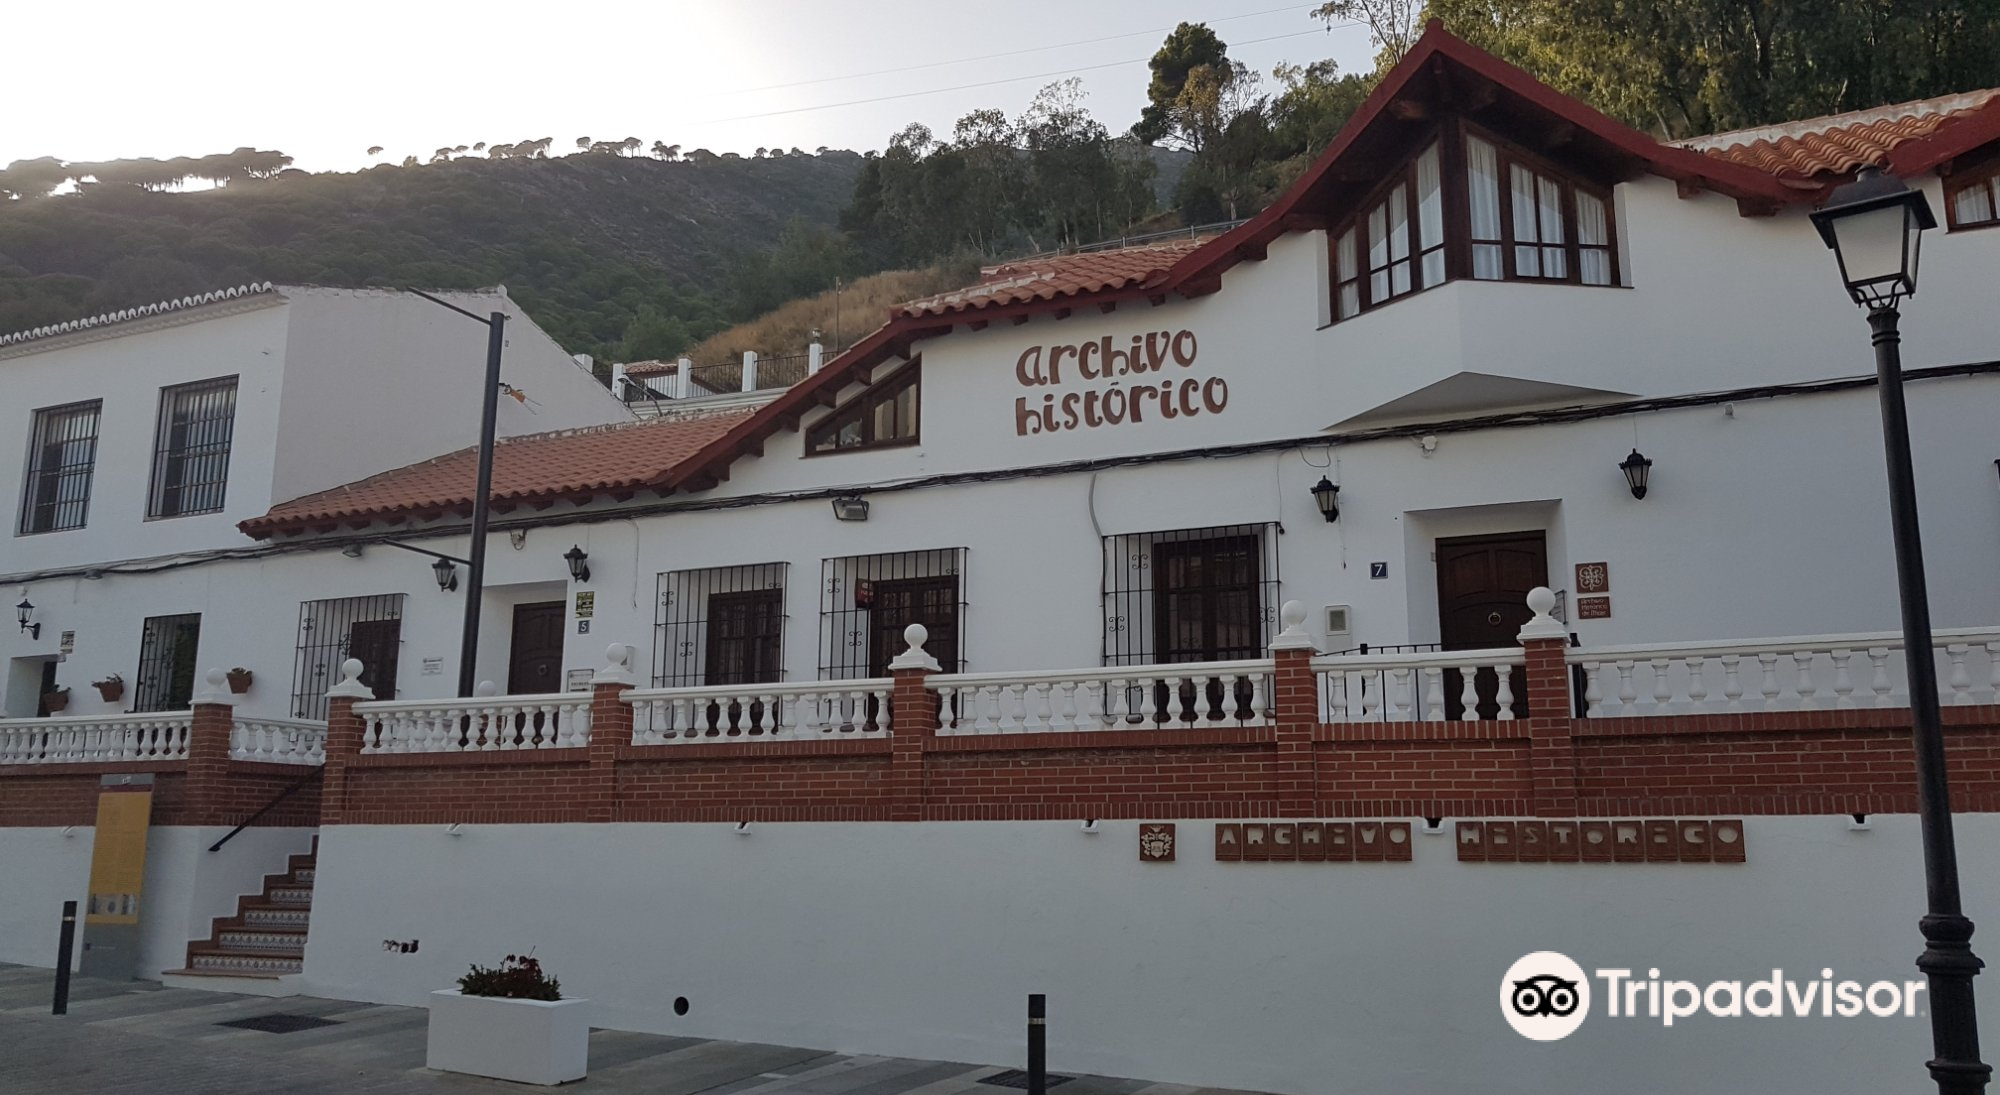 Archivo Historico Municipal de Mijas